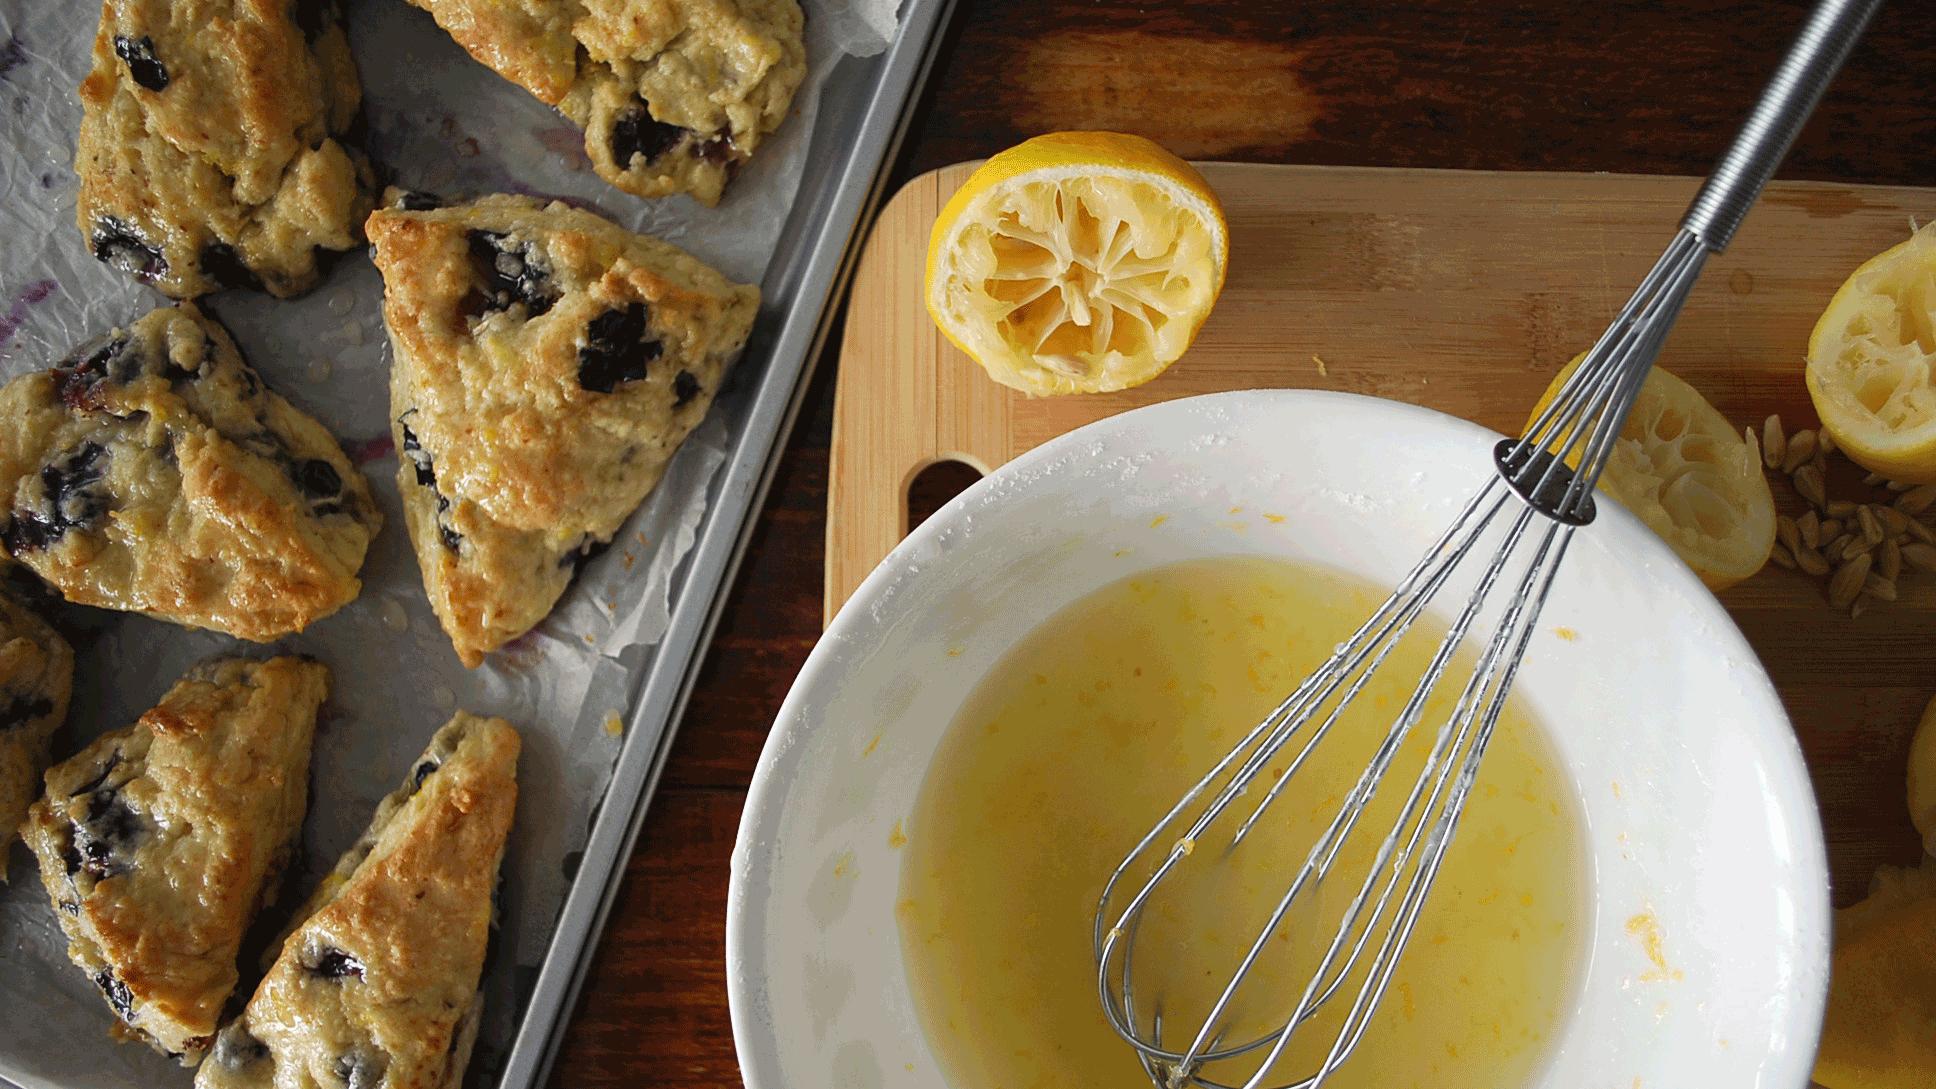 kitchen-whiskers-blueberry-scones-lemon-glaze